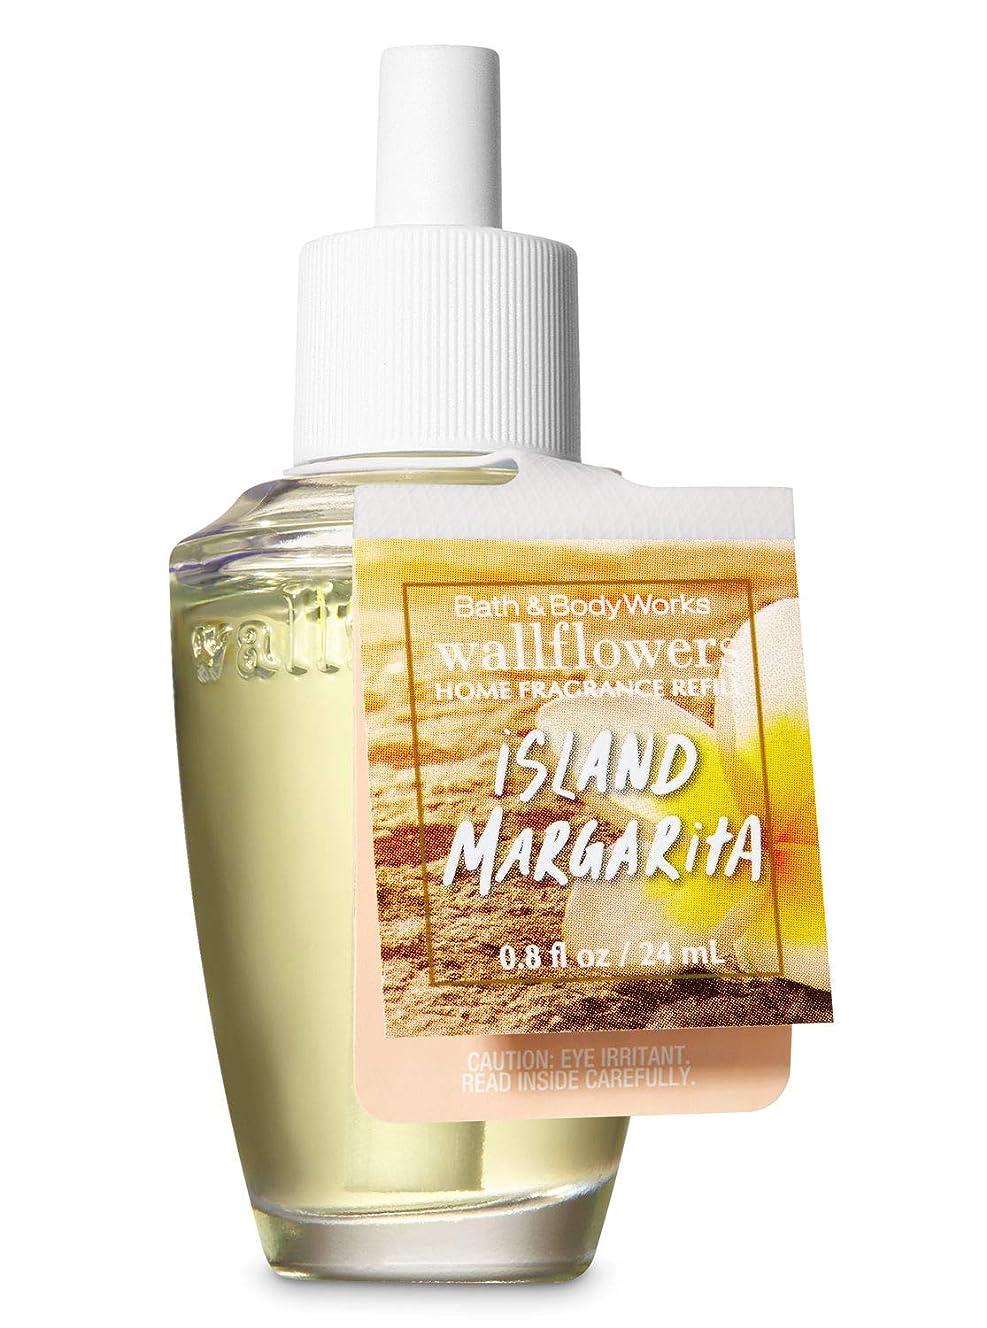 【Bath&Body Works/バス&ボディワークス】 ルームフレグランス 詰替えリフィル アイランドマルガリータ Wallflowers Home Fragrance Refill Island Margarita [並行輸入品]